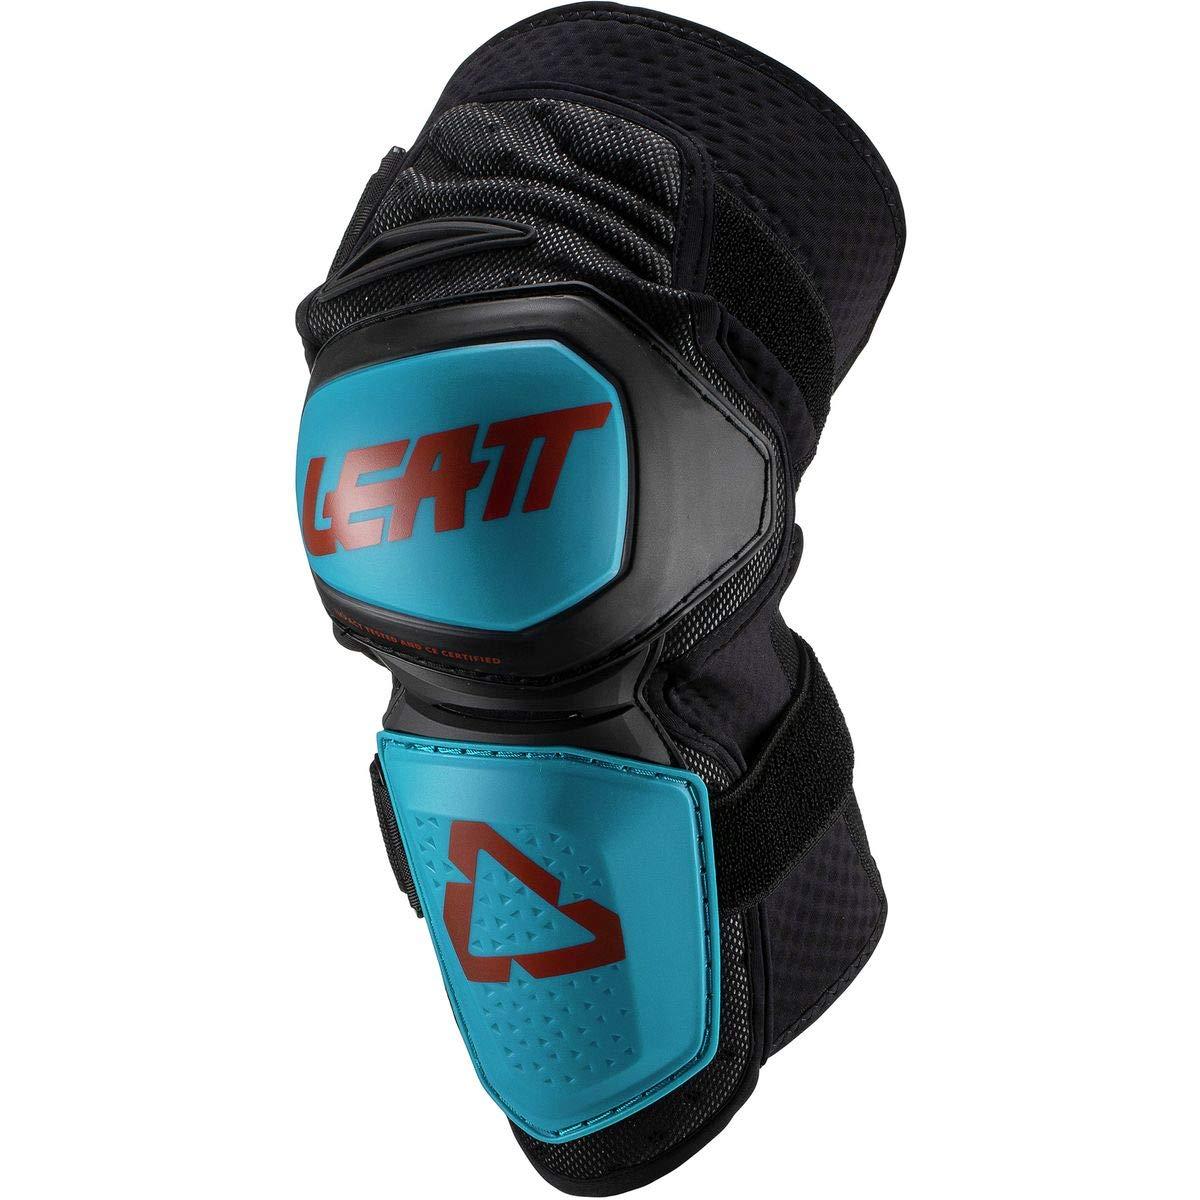 Leatt 2019 Enduro Knee Guards (Small/Medium) (Fuel/Black)